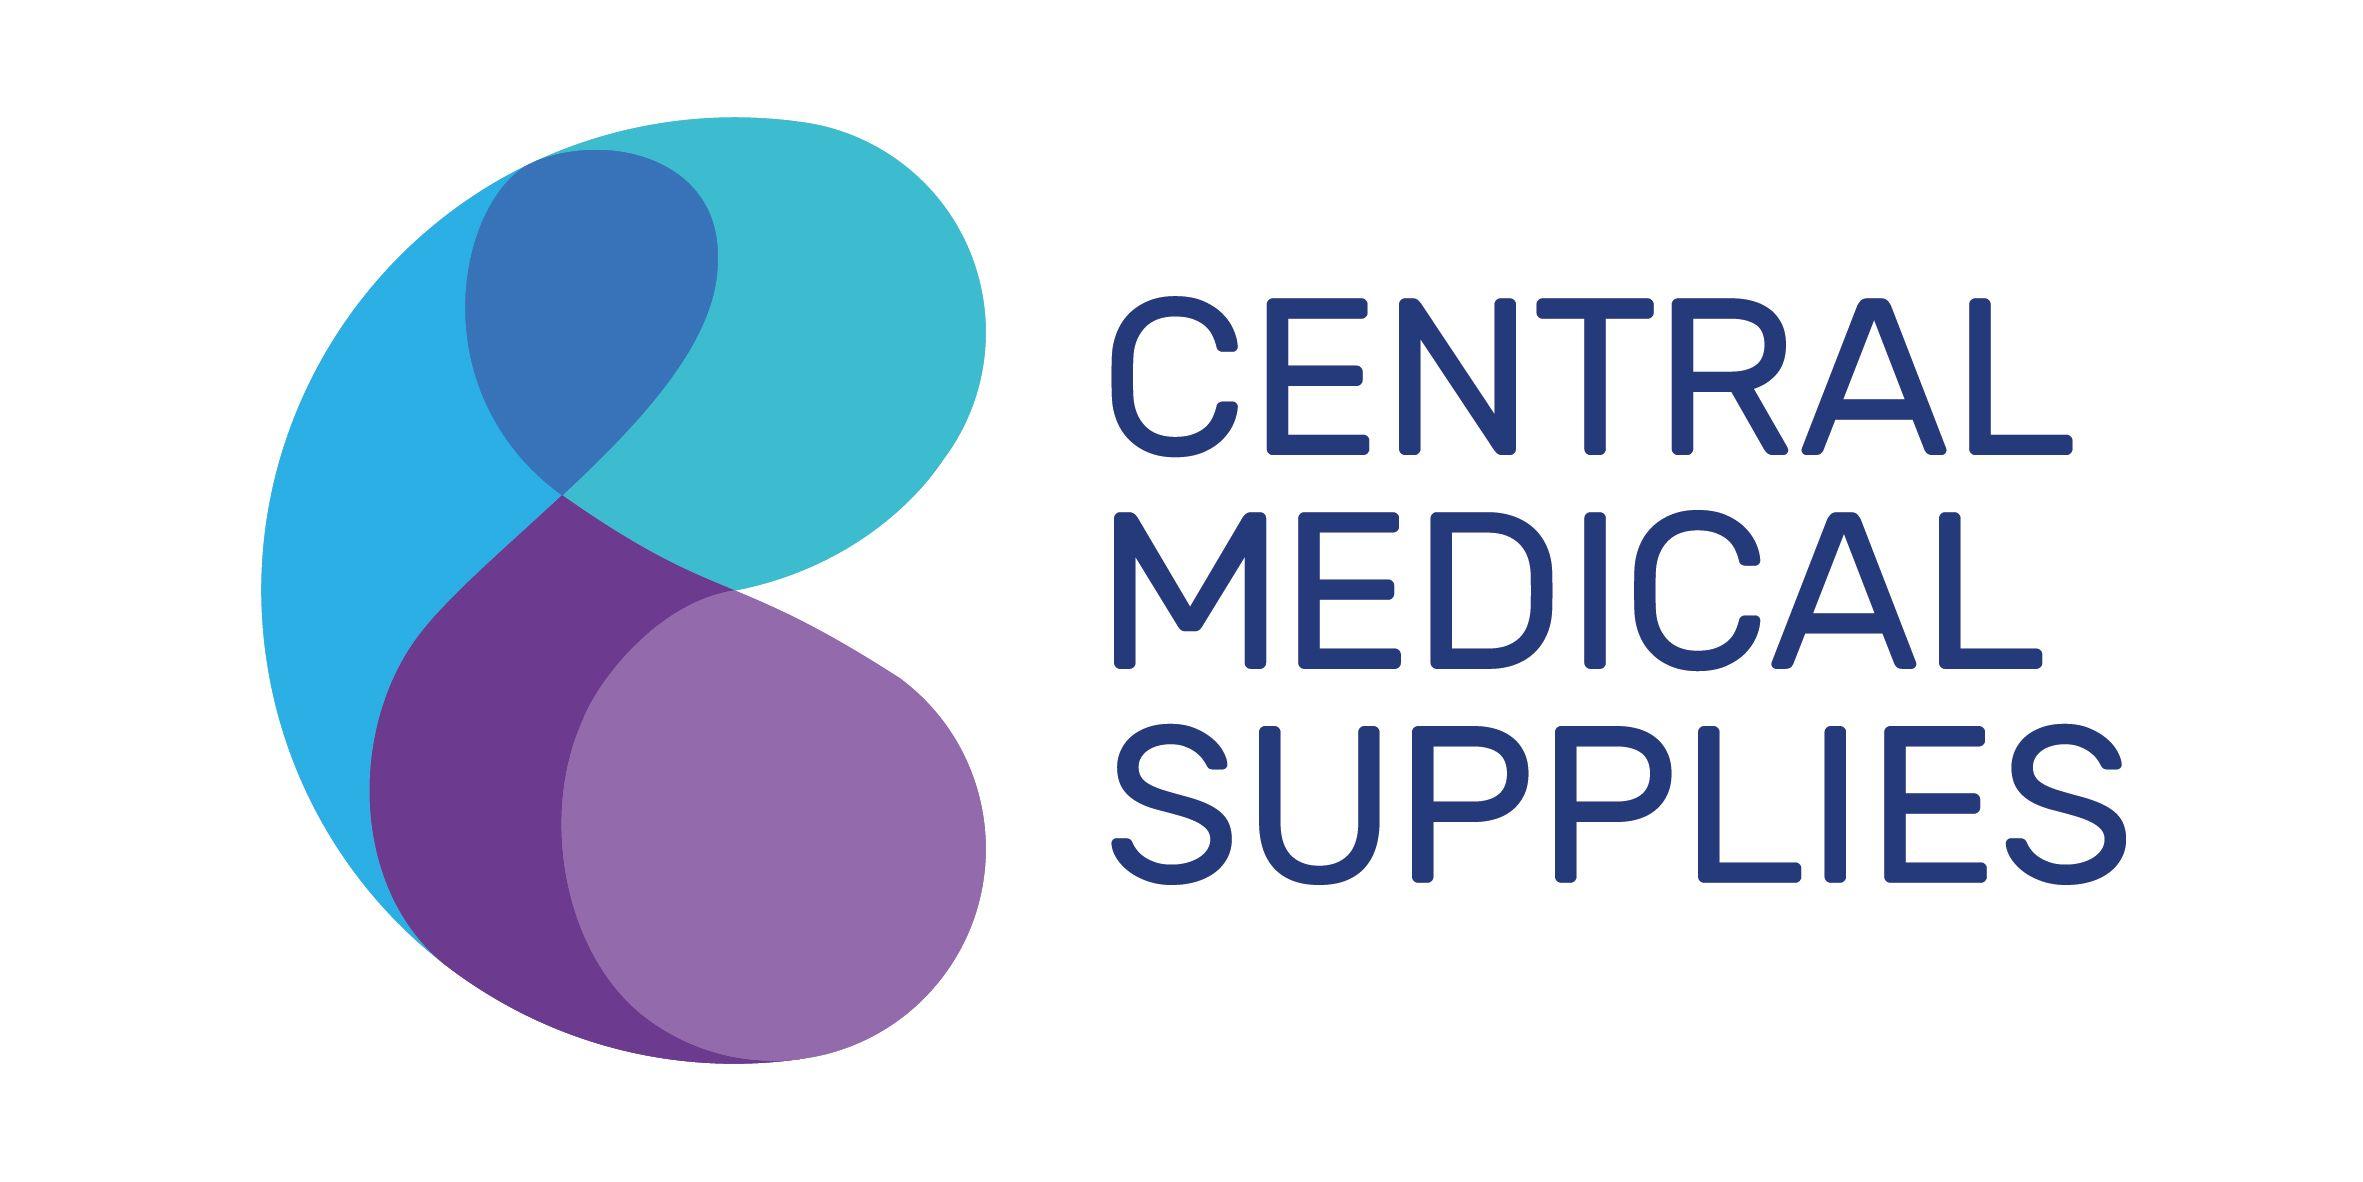 Central Medical Supplies